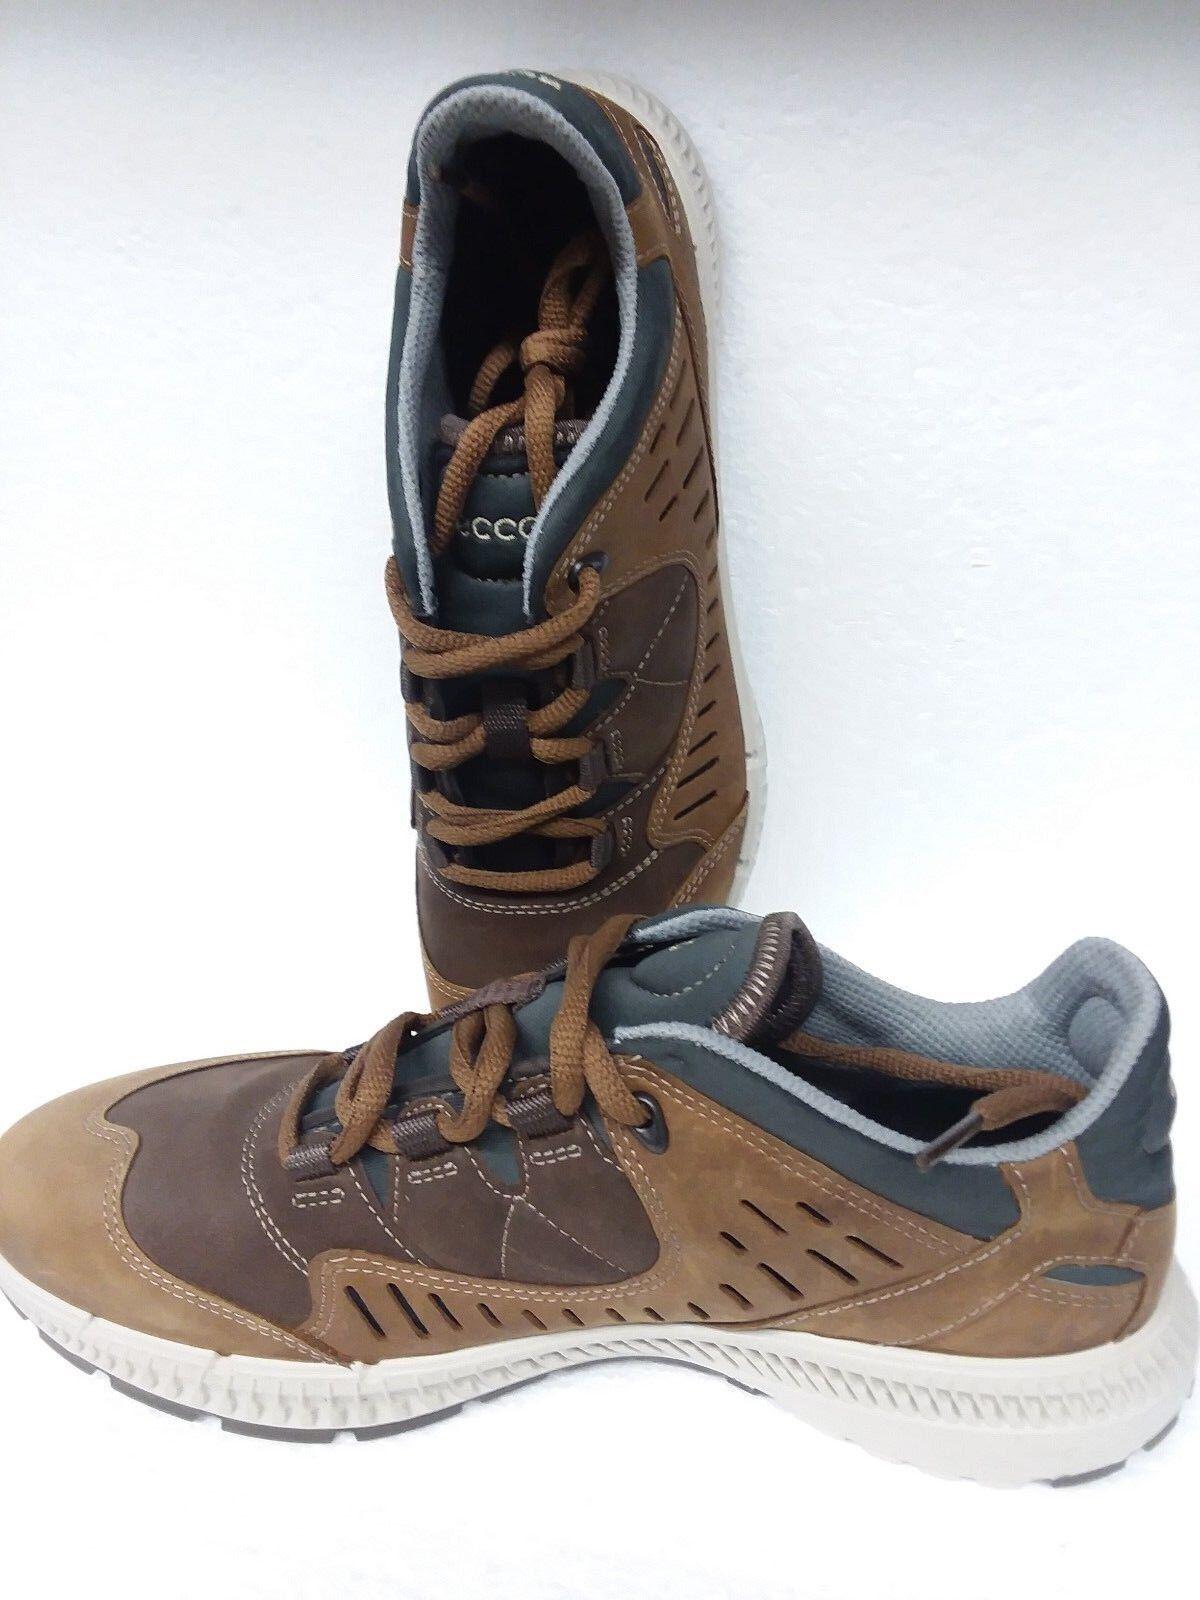 Ecco Terrawalk, CAMEL COCOA BROWN, Size; 6-6.5